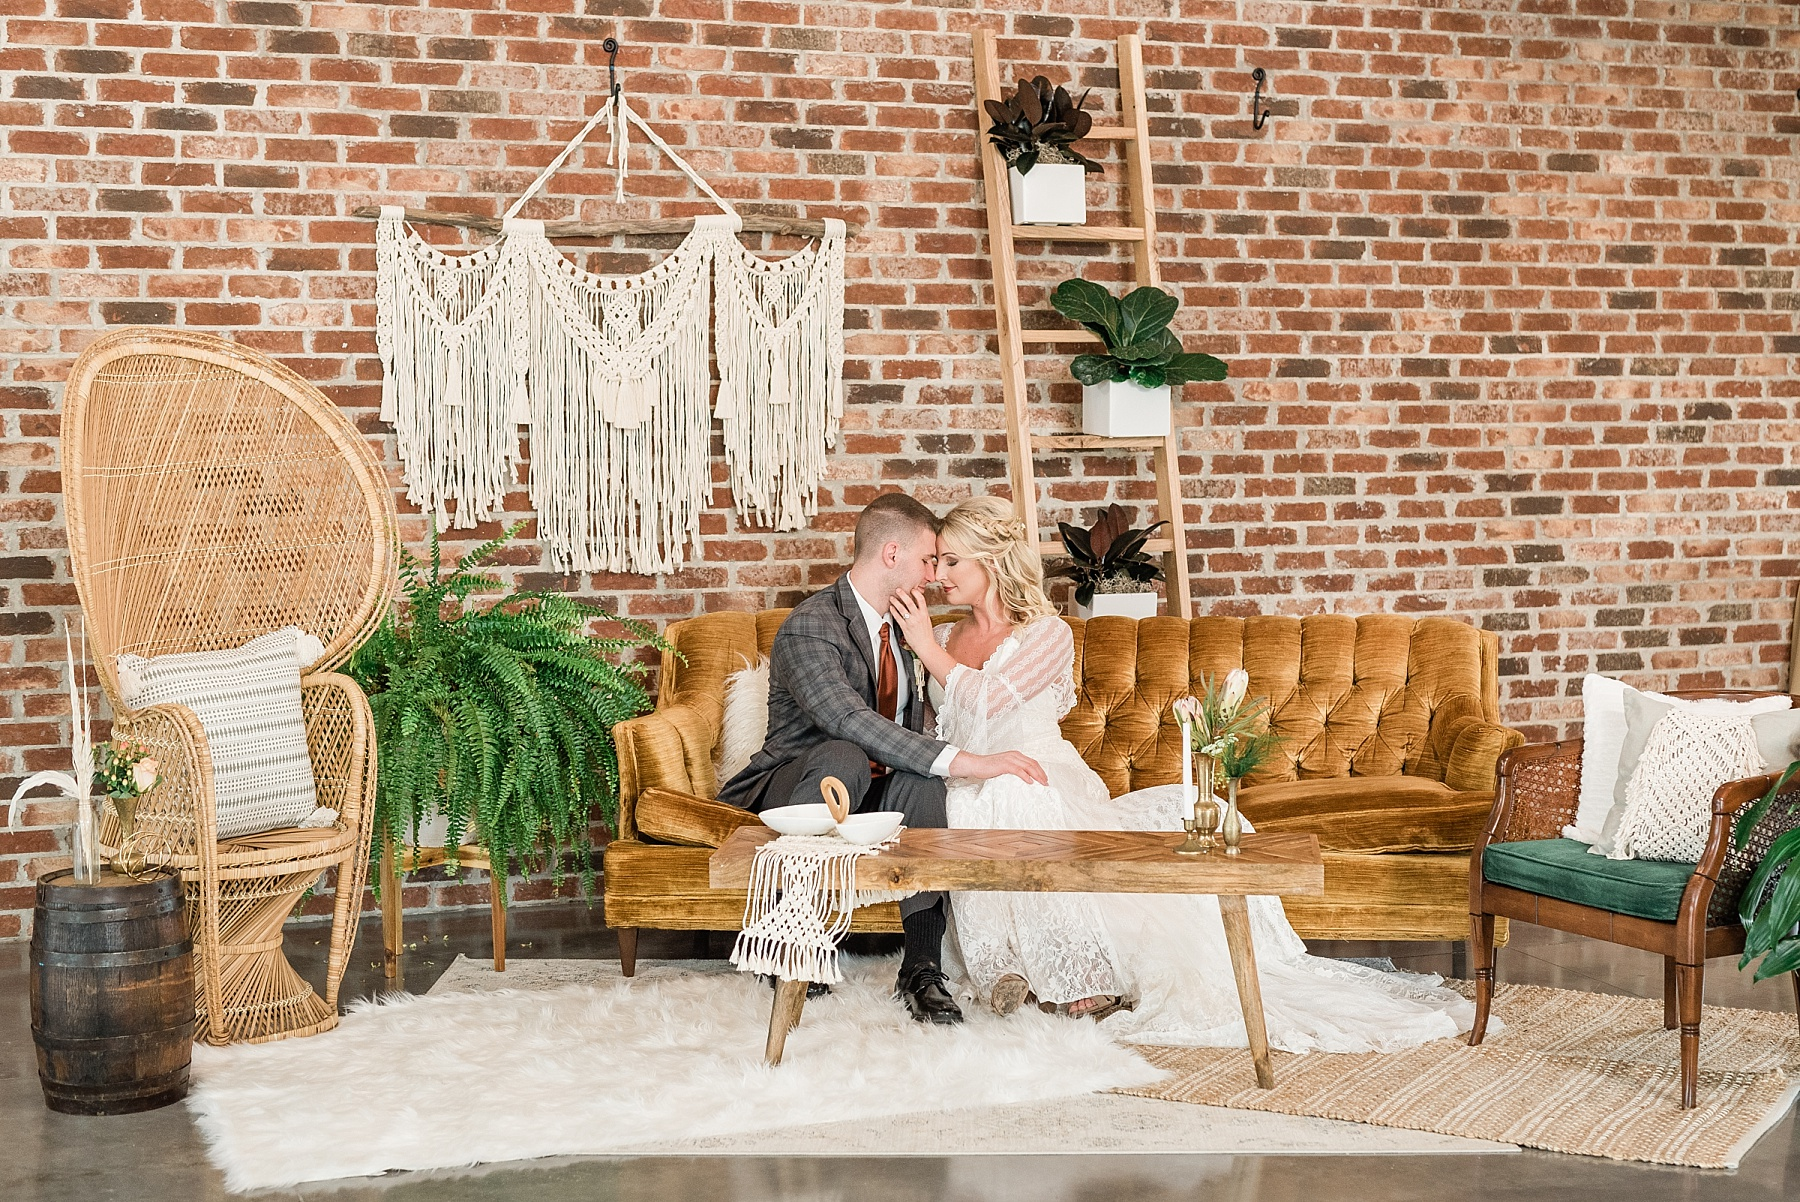 Eclectic Scandinavian Winter Wedding in All White Venue Emerson Fields by Kelsi Kliethermes Photography Best Missouri and Maui Wedding Photographer_0017.jpg